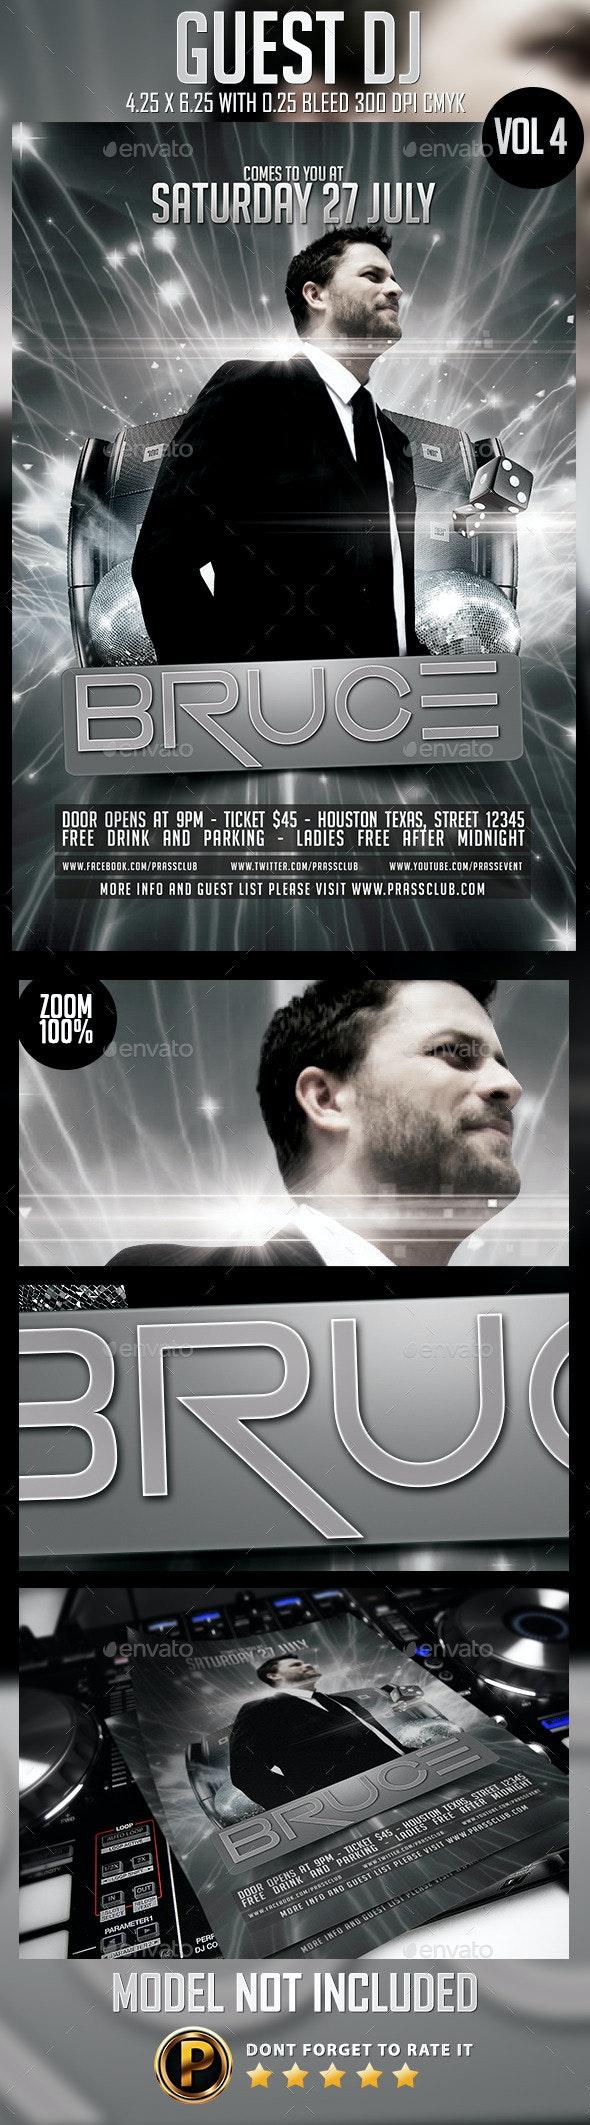 Guest DJ Flyer Template Vol 4 - Clubs & Parties Events